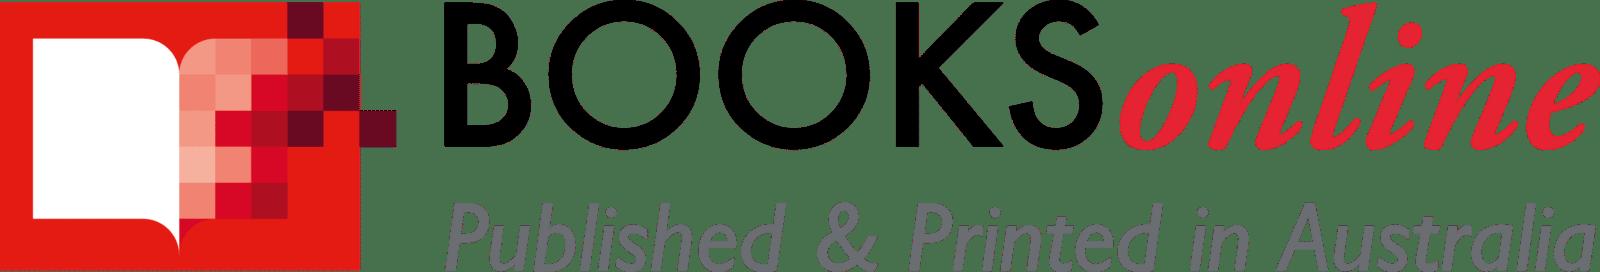 Books-online-logo-with-text-tagline